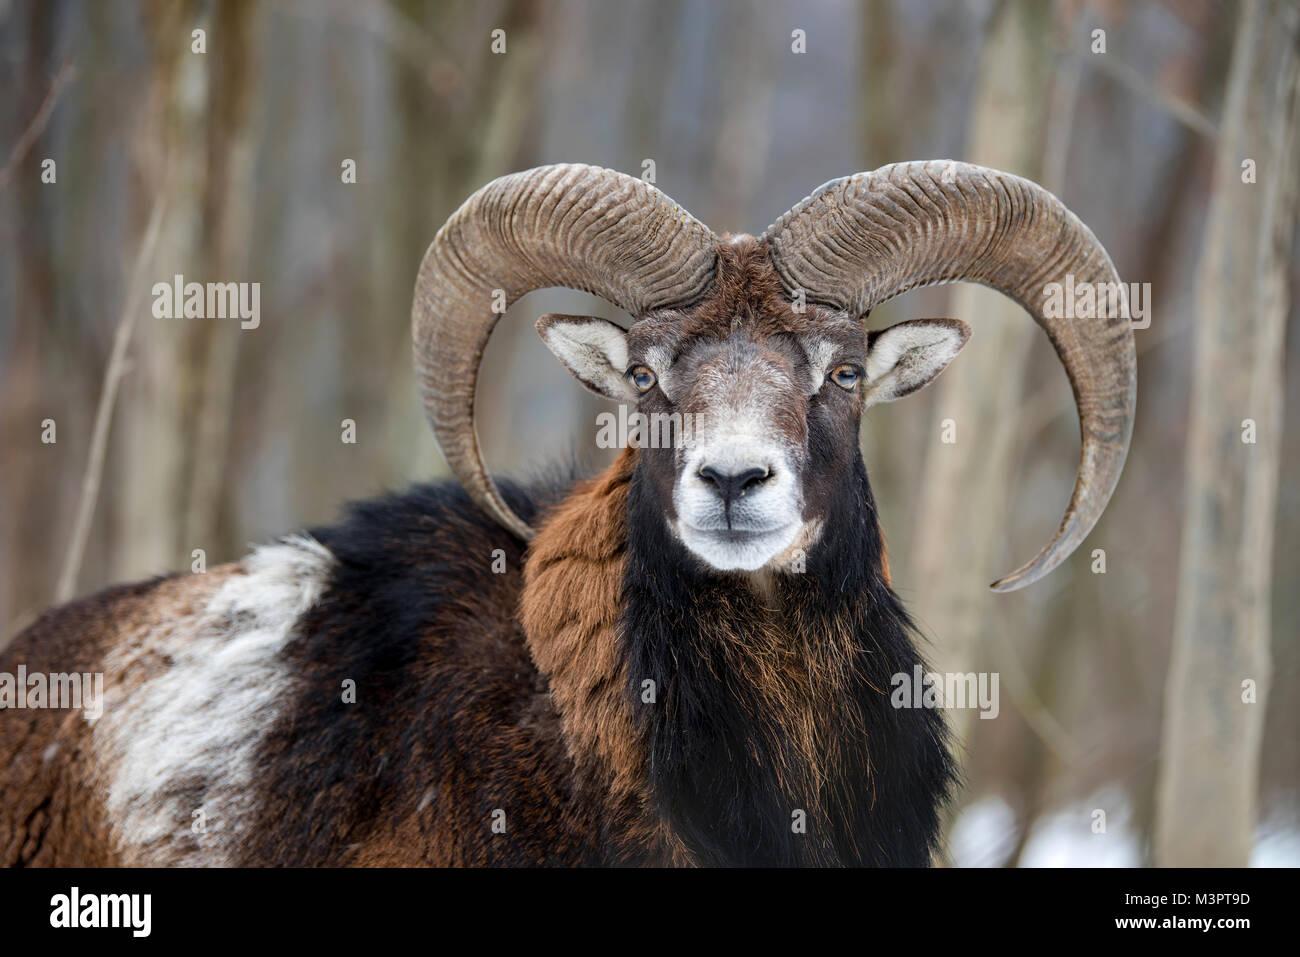 Winter portrait of big mouflon animal. Mouflon, Ovis orientalis, forest horned animal in nature habitat - Stock Image